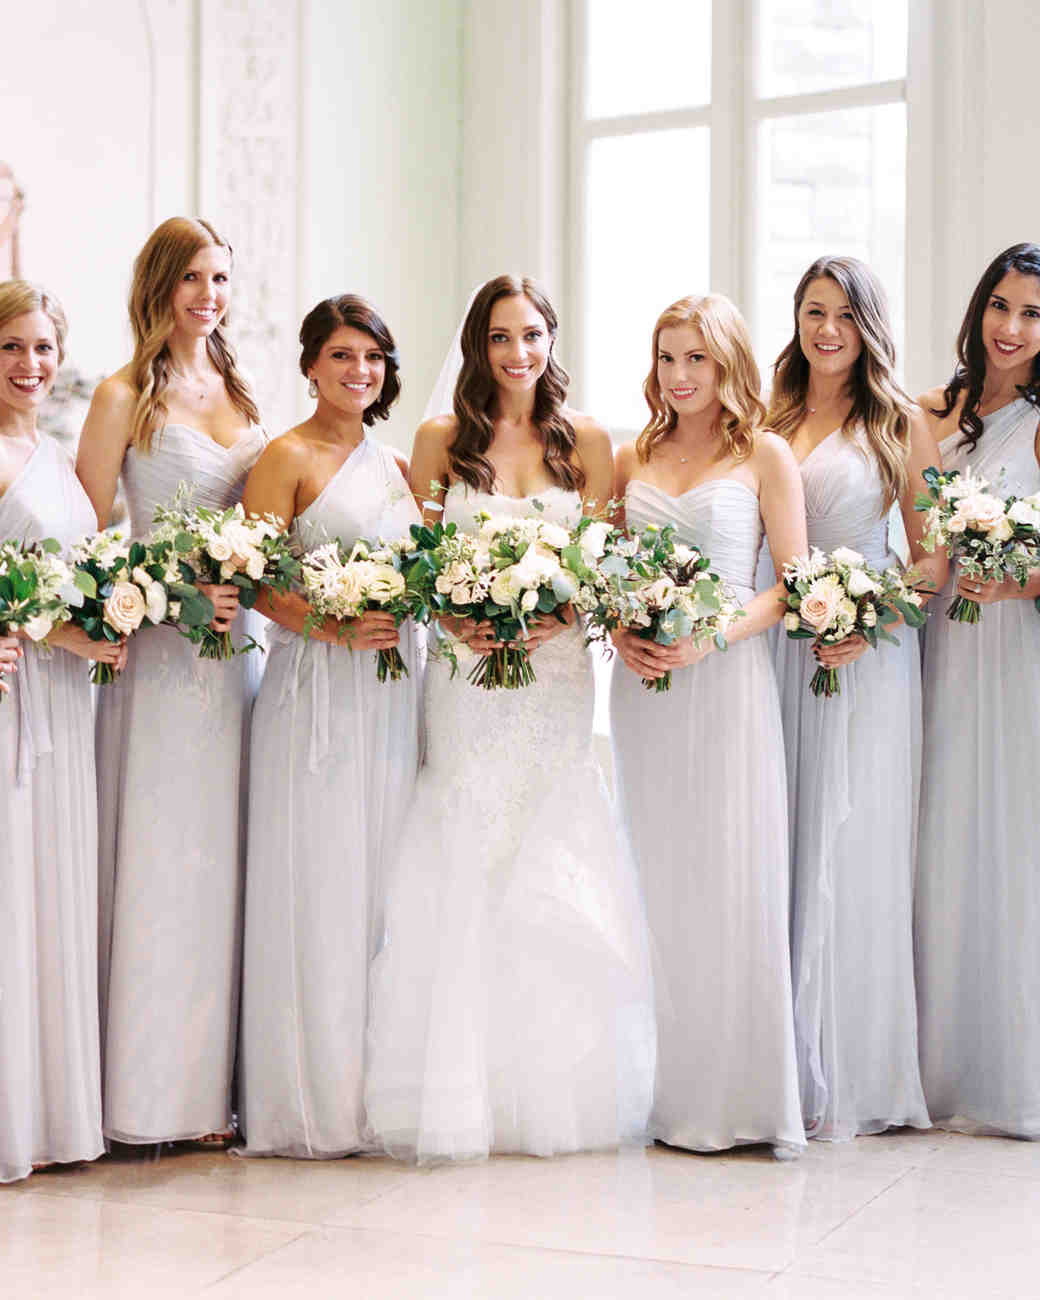 jackie-ross-wedding-bridesmaids-072-s111775-0215.jpg